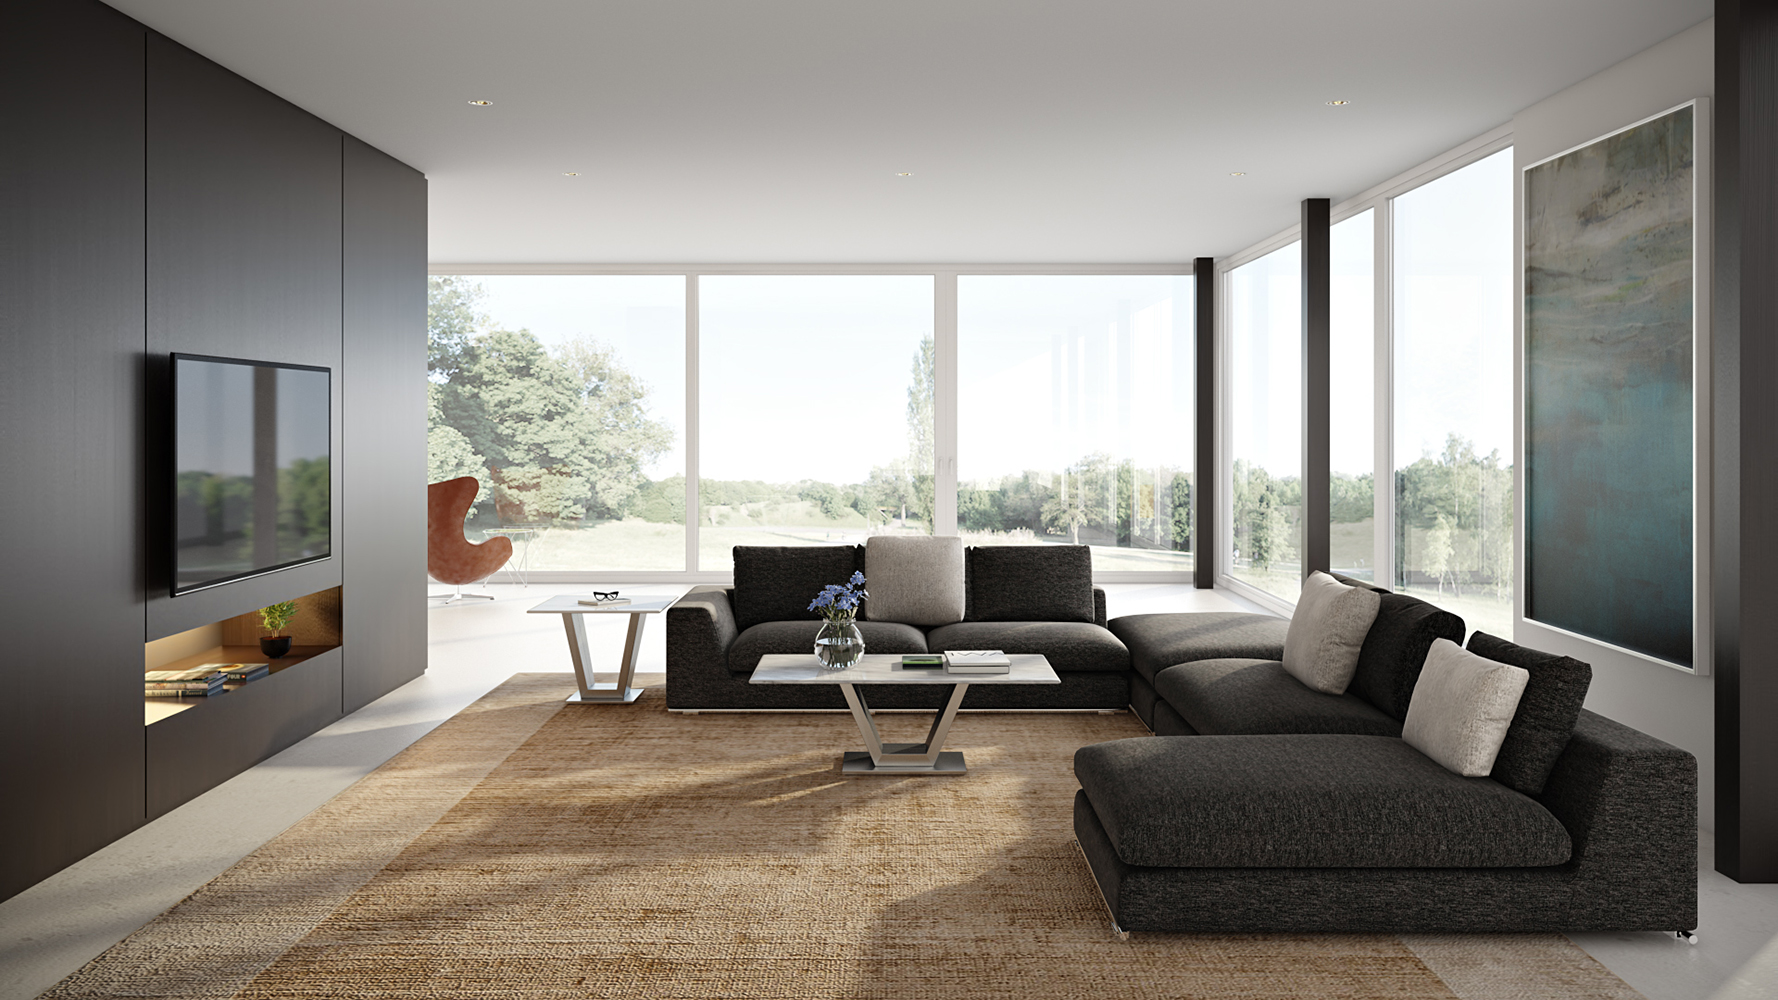 Comodo Sectional Sofa With Ottoman - Charcoal | Zuri Furniture